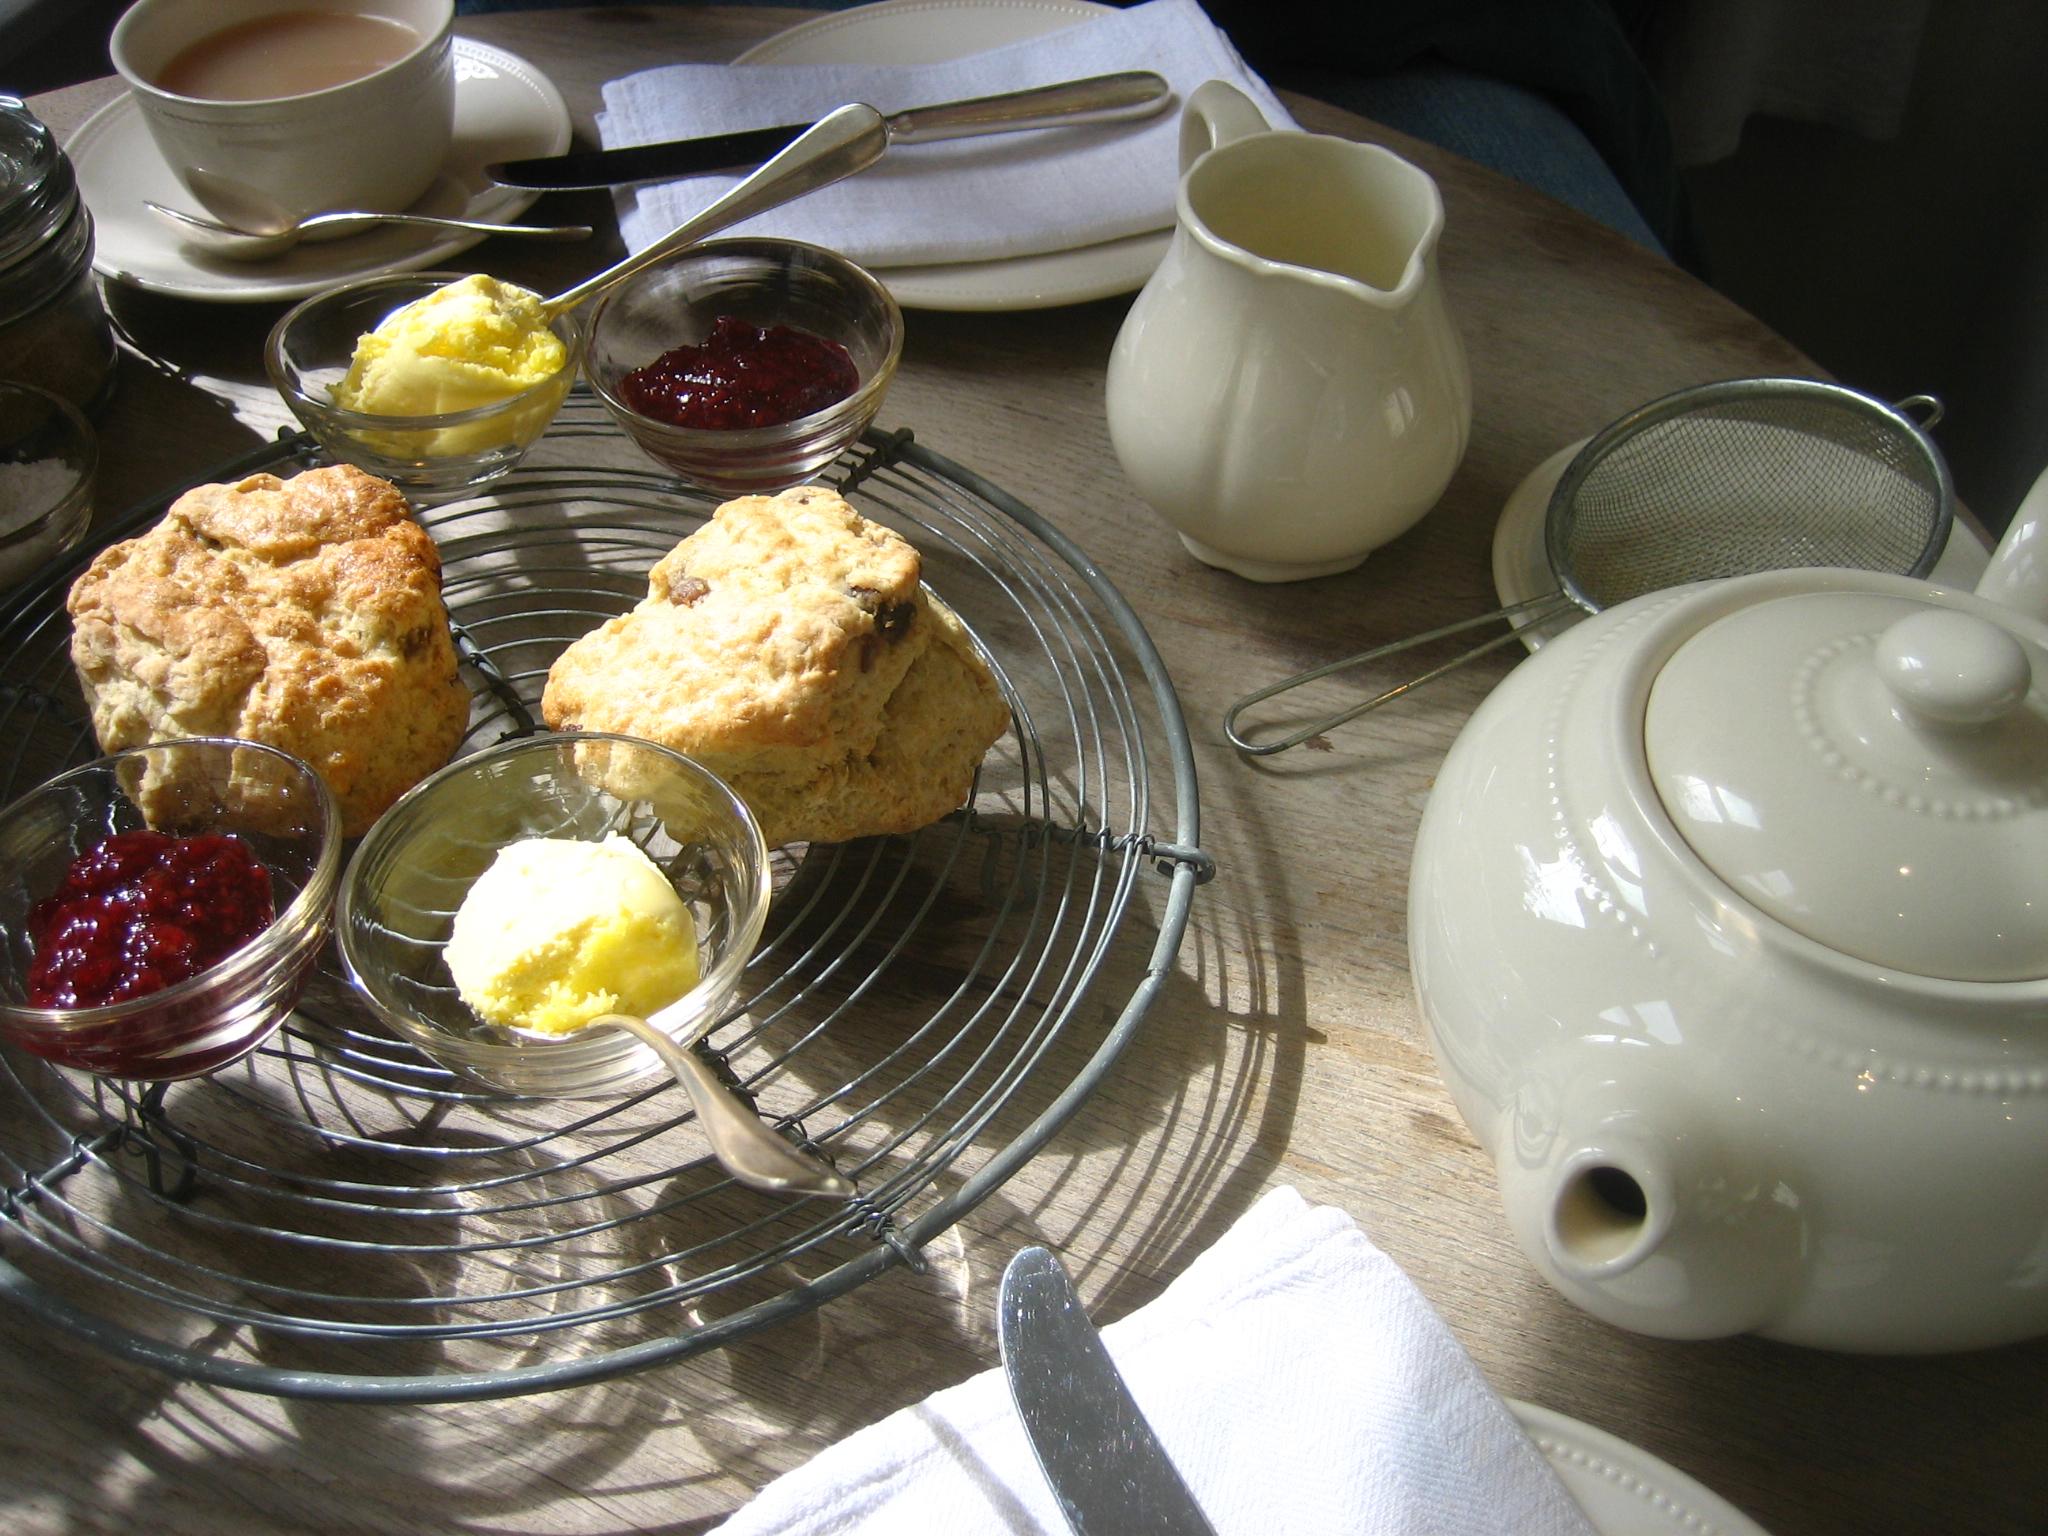 https://upload.wikimedia.org/wikipedia/commons/f/f9/Tea_and_scones_2.jpg